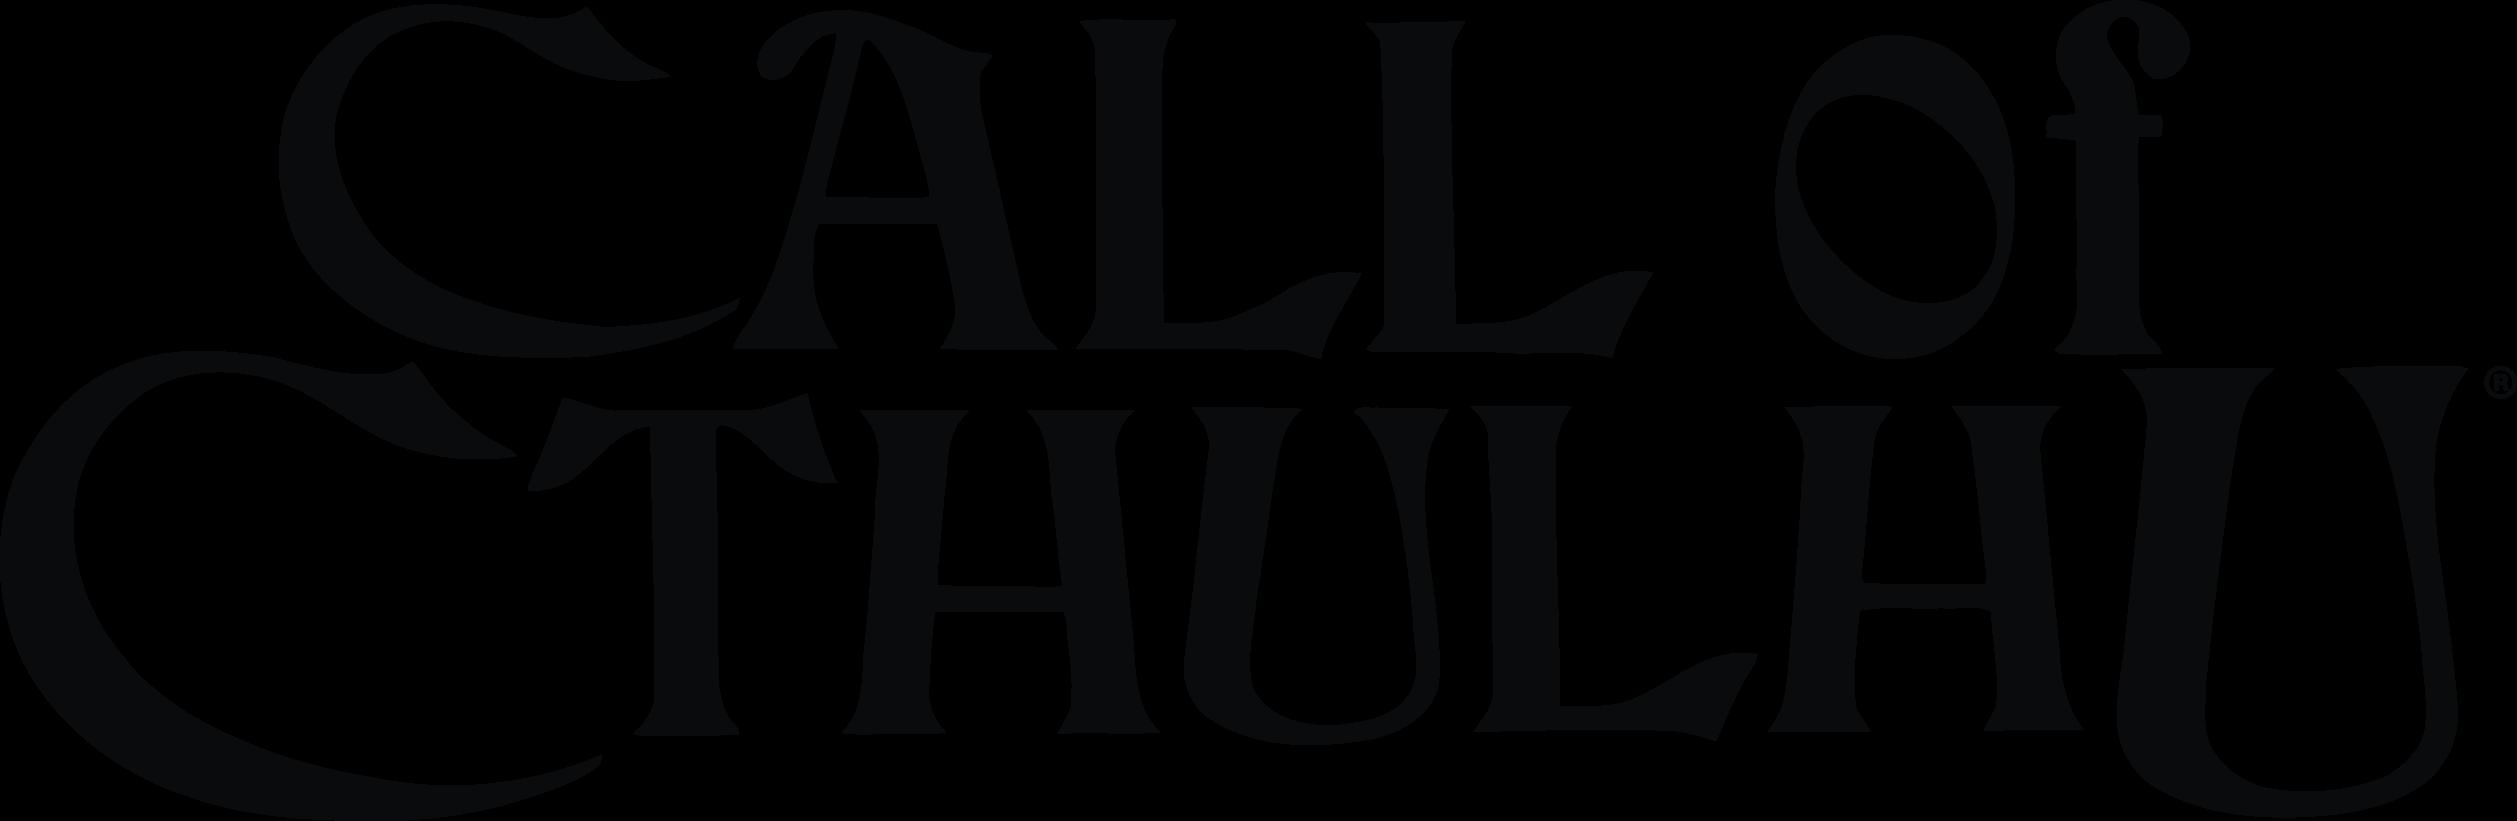 Call of Cthulhu logo